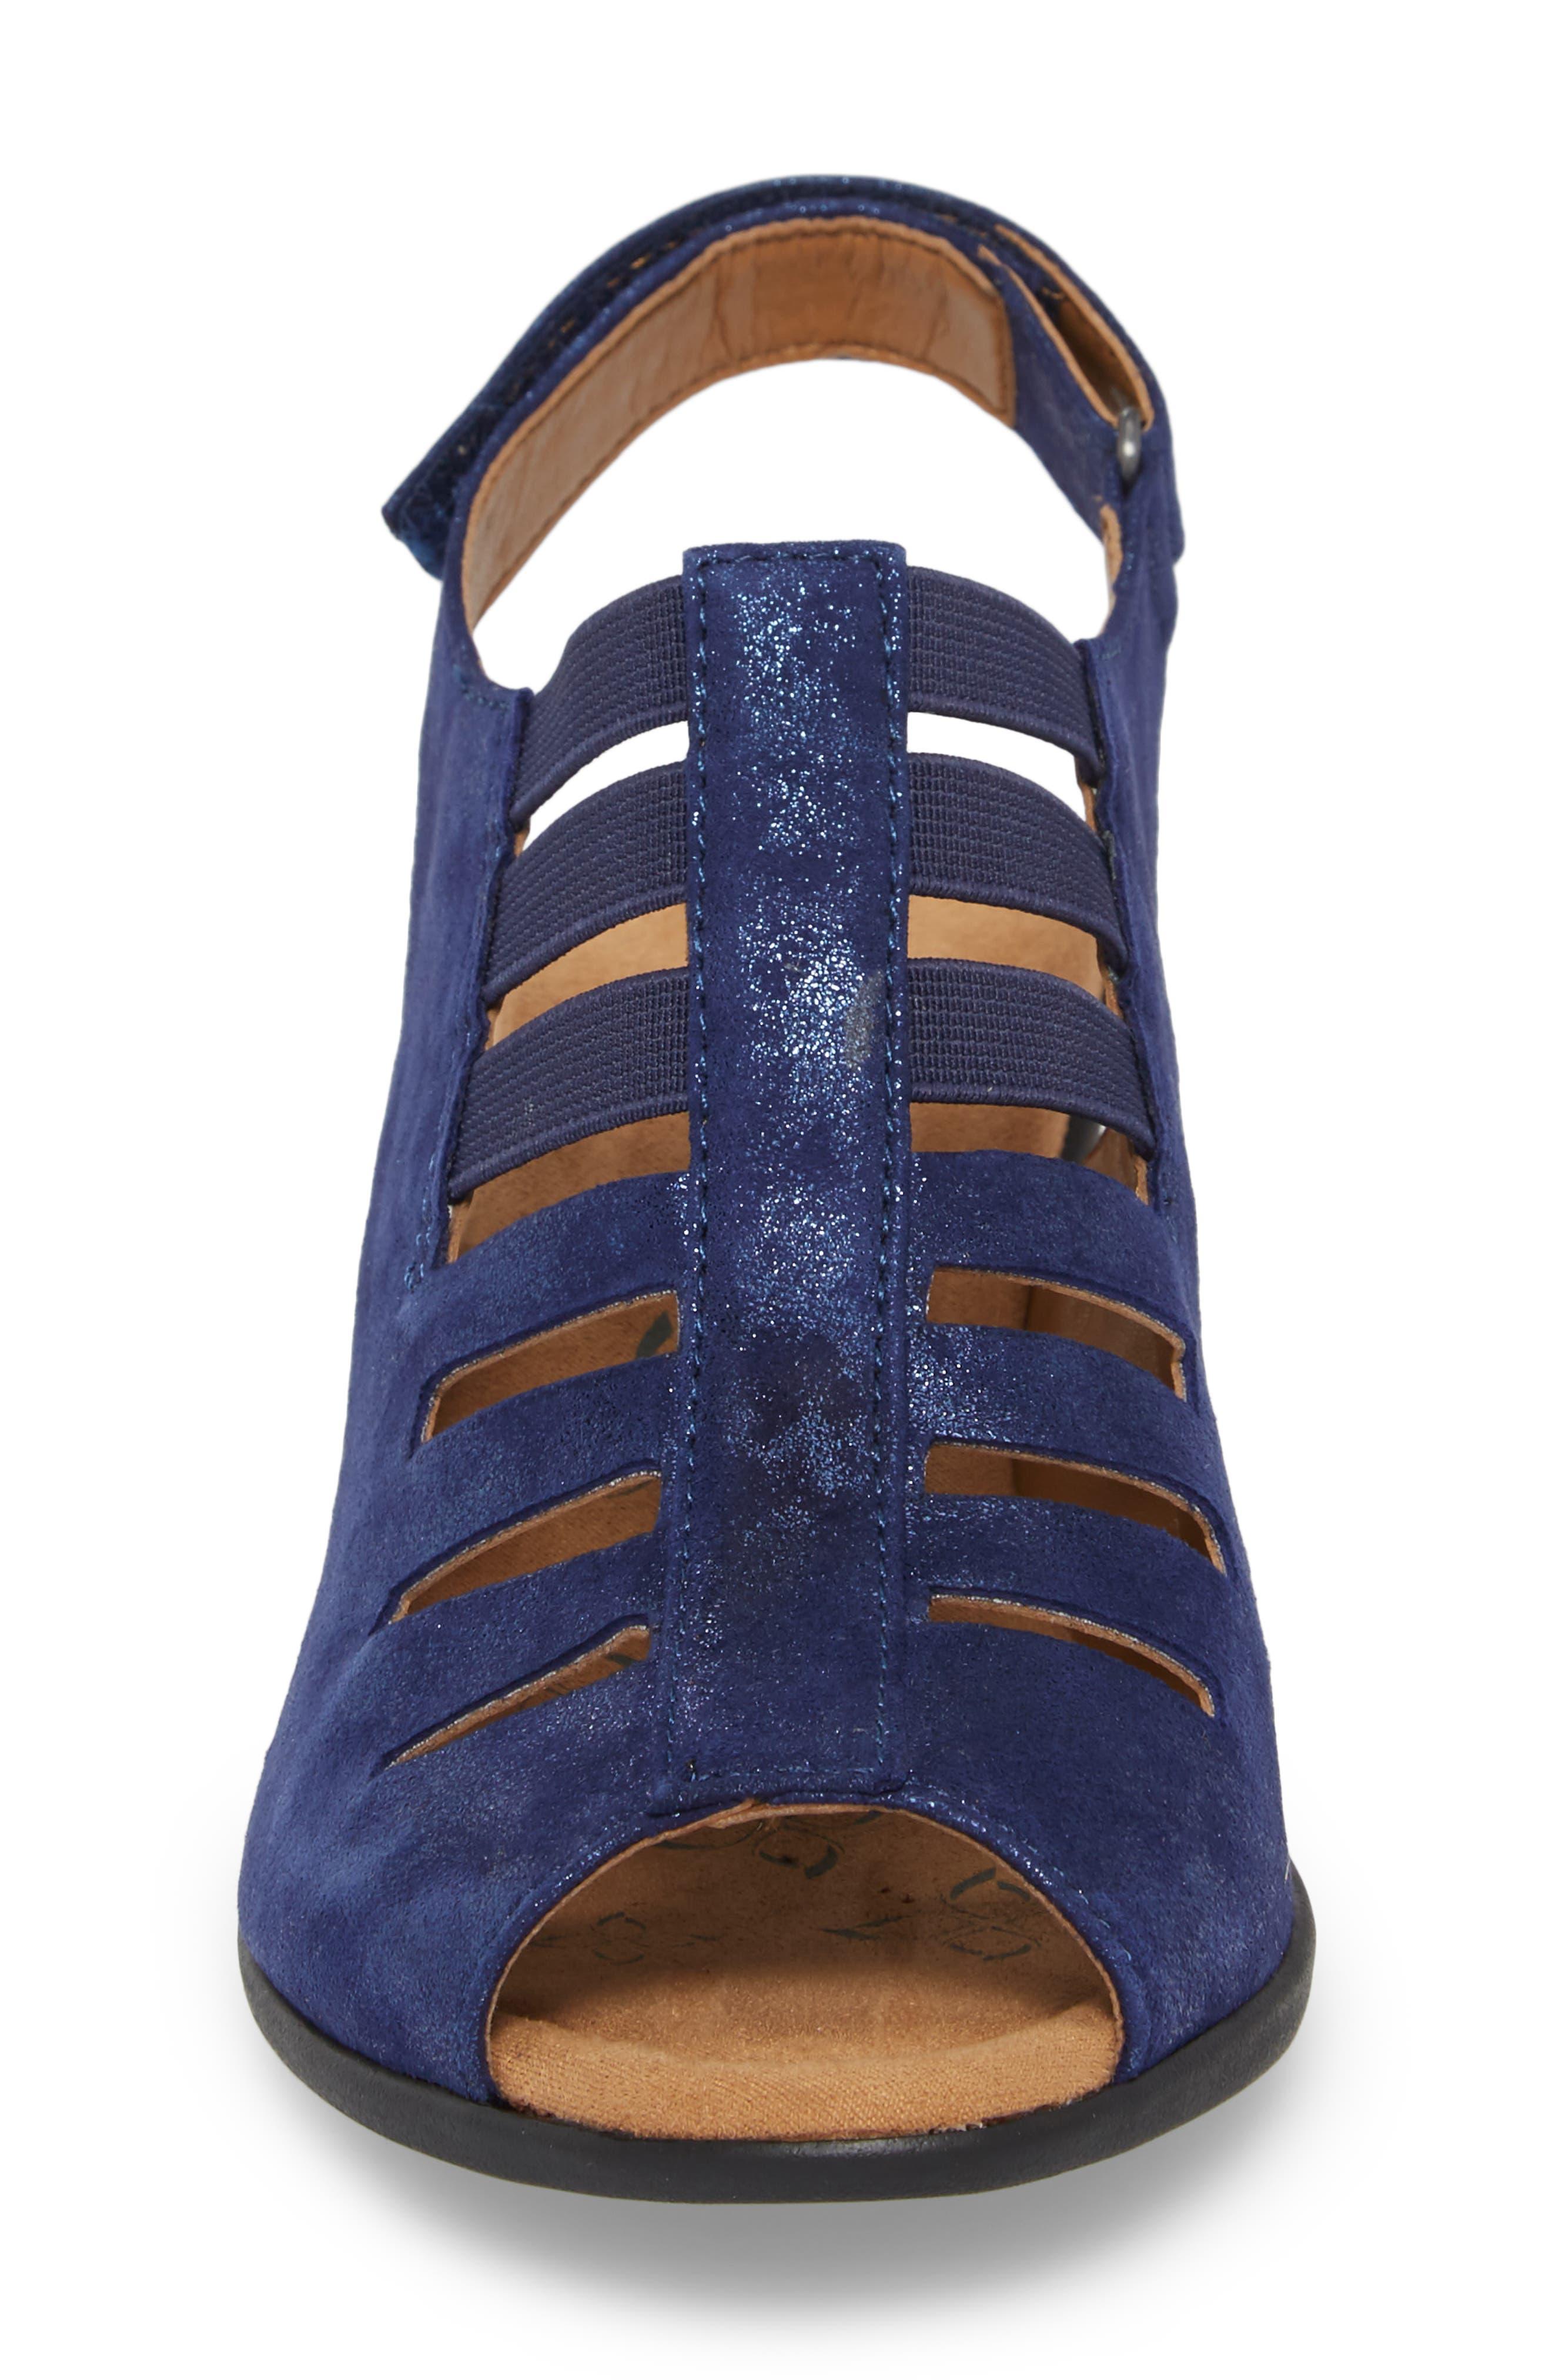 Faye Sandal,                             Alternate thumbnail 4, color,                             Pea Coat Navy Leather